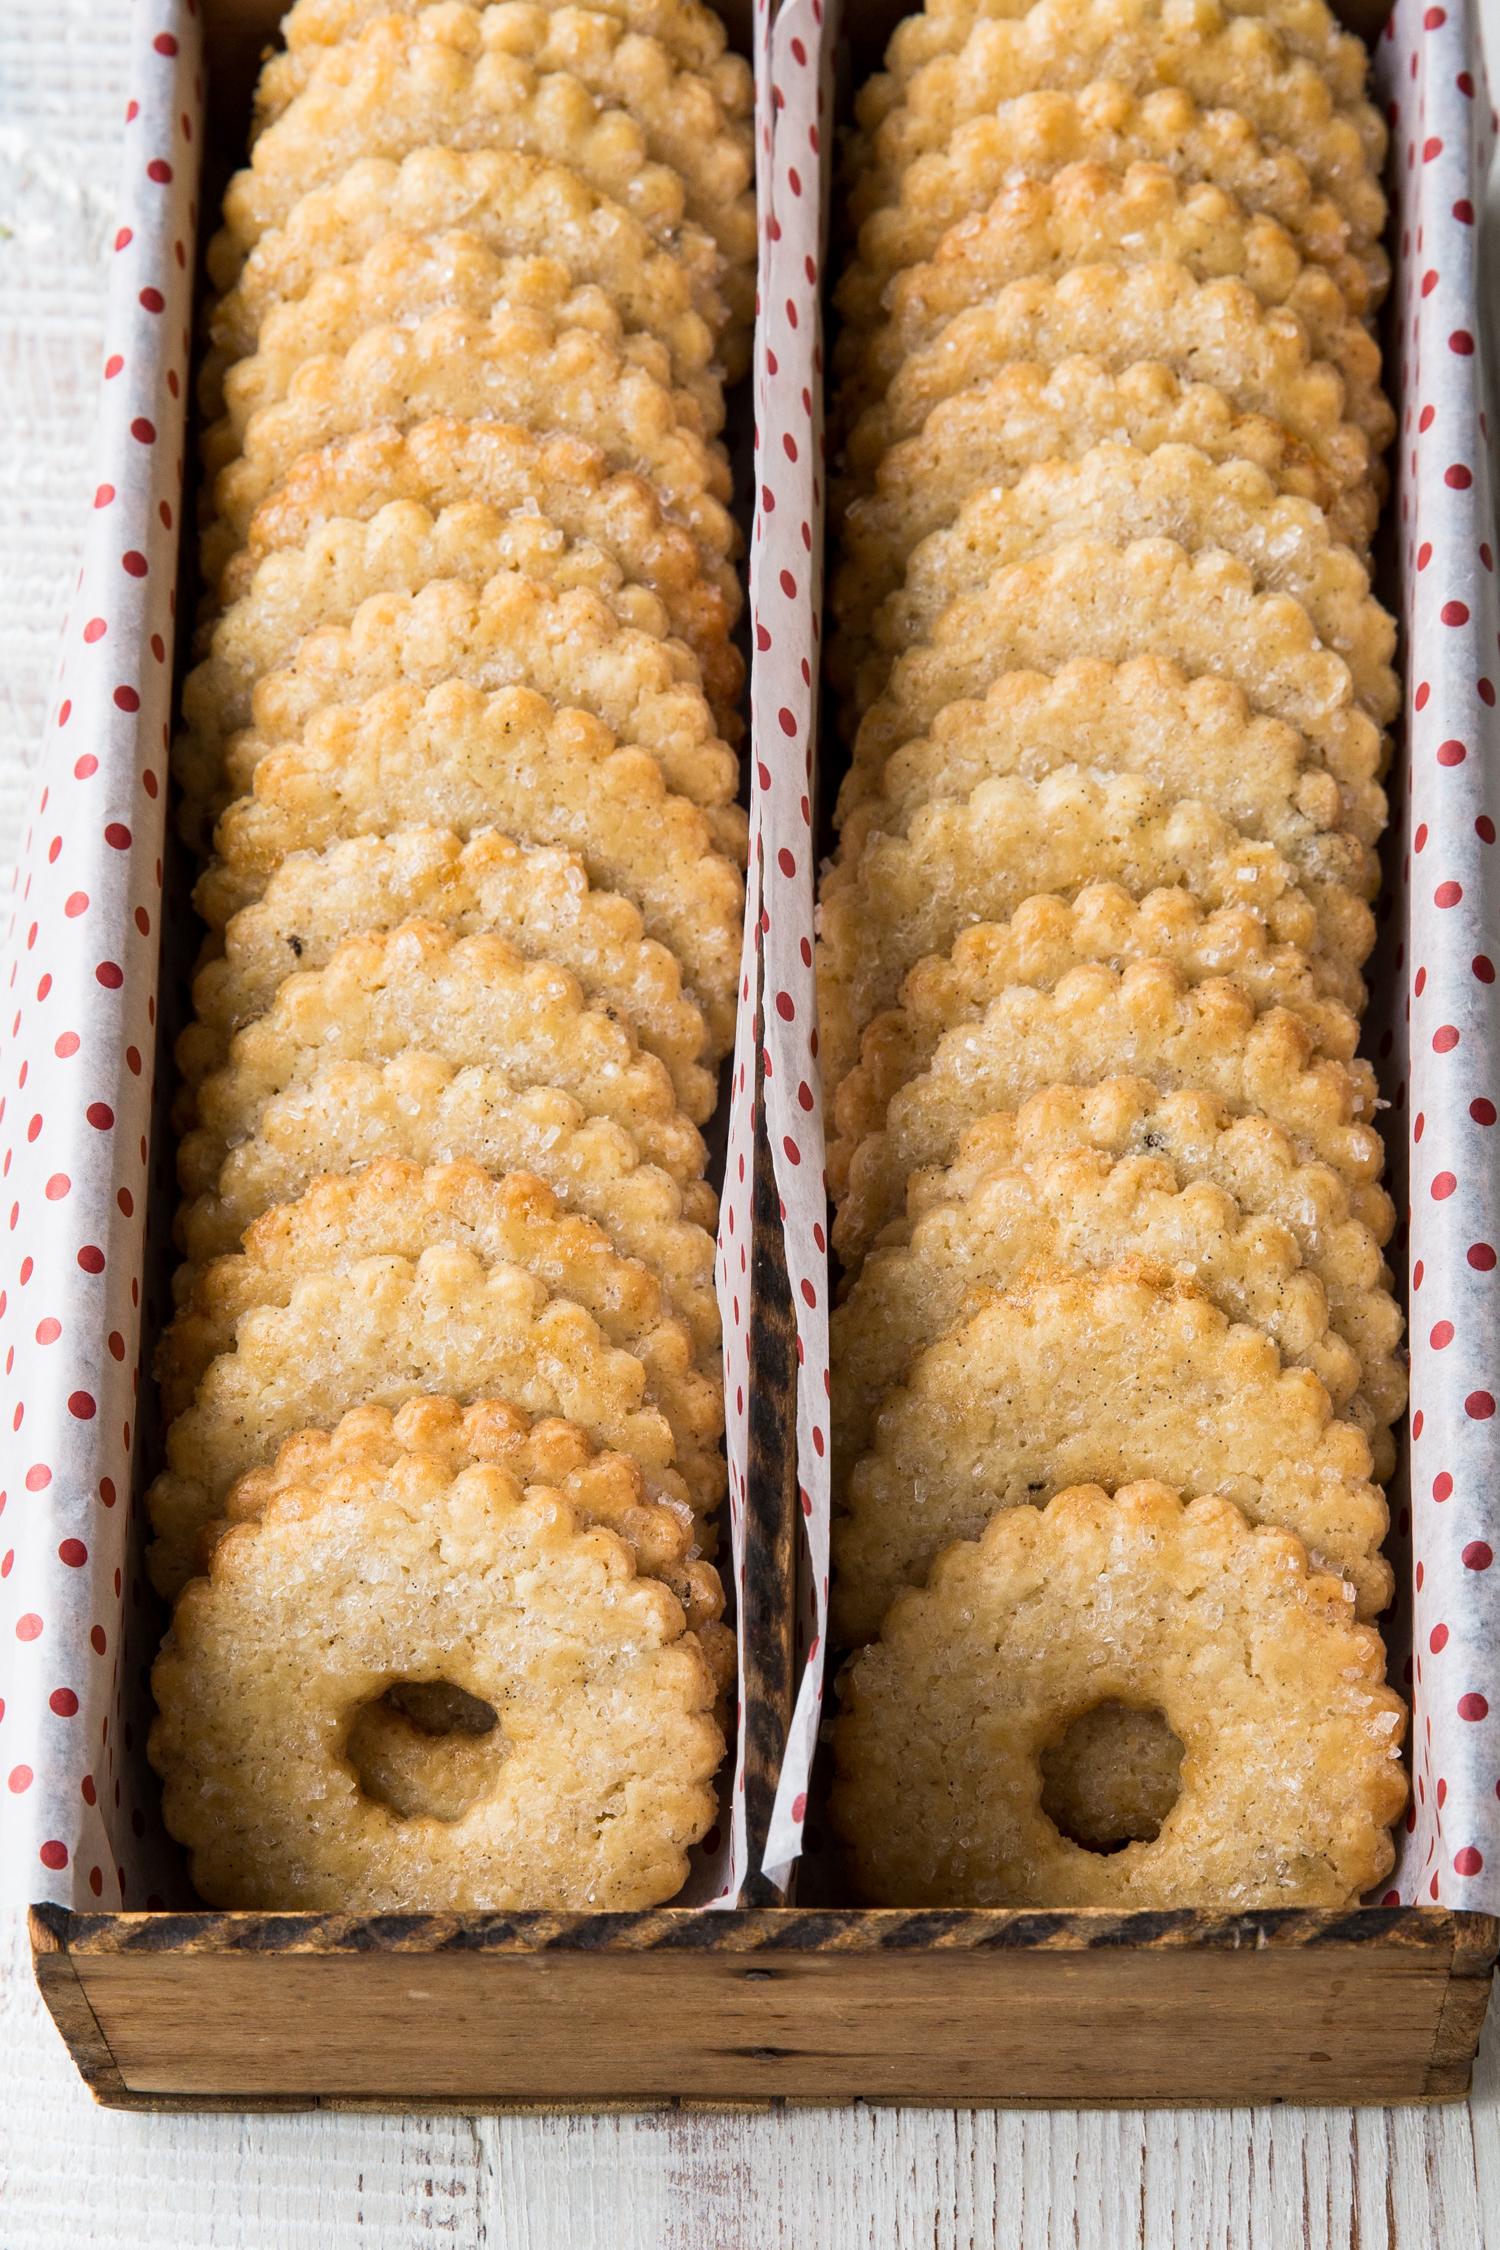 erinscottphotography_holidaycookies-46.jpg